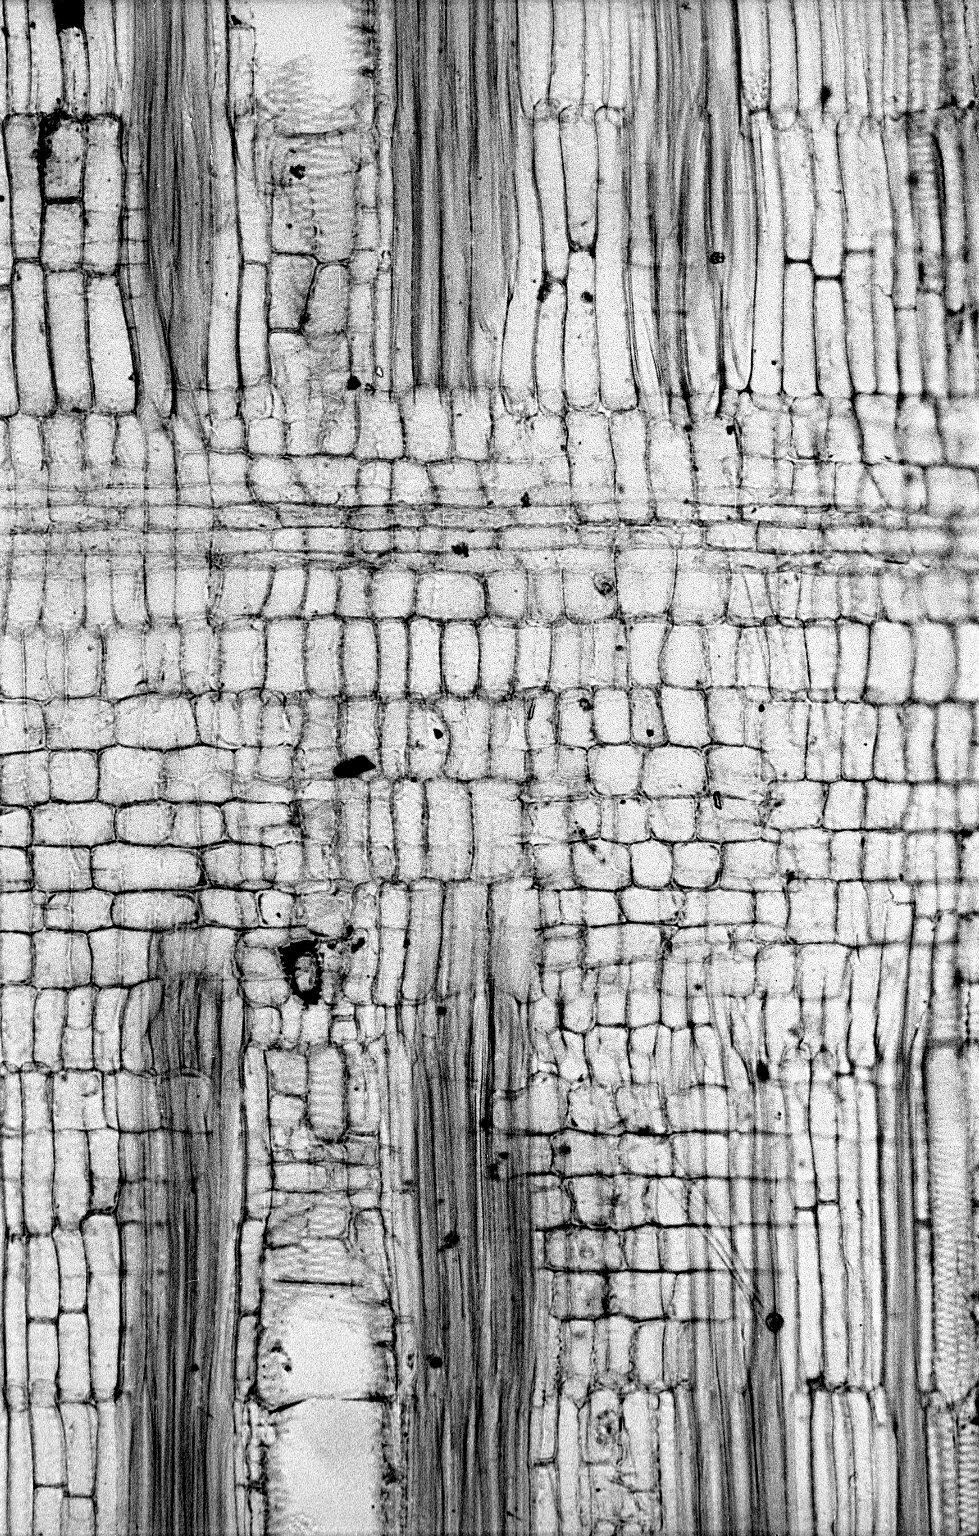 LEGUMINOSAE PAPILIONOIDEAE Millettia pachycarpa